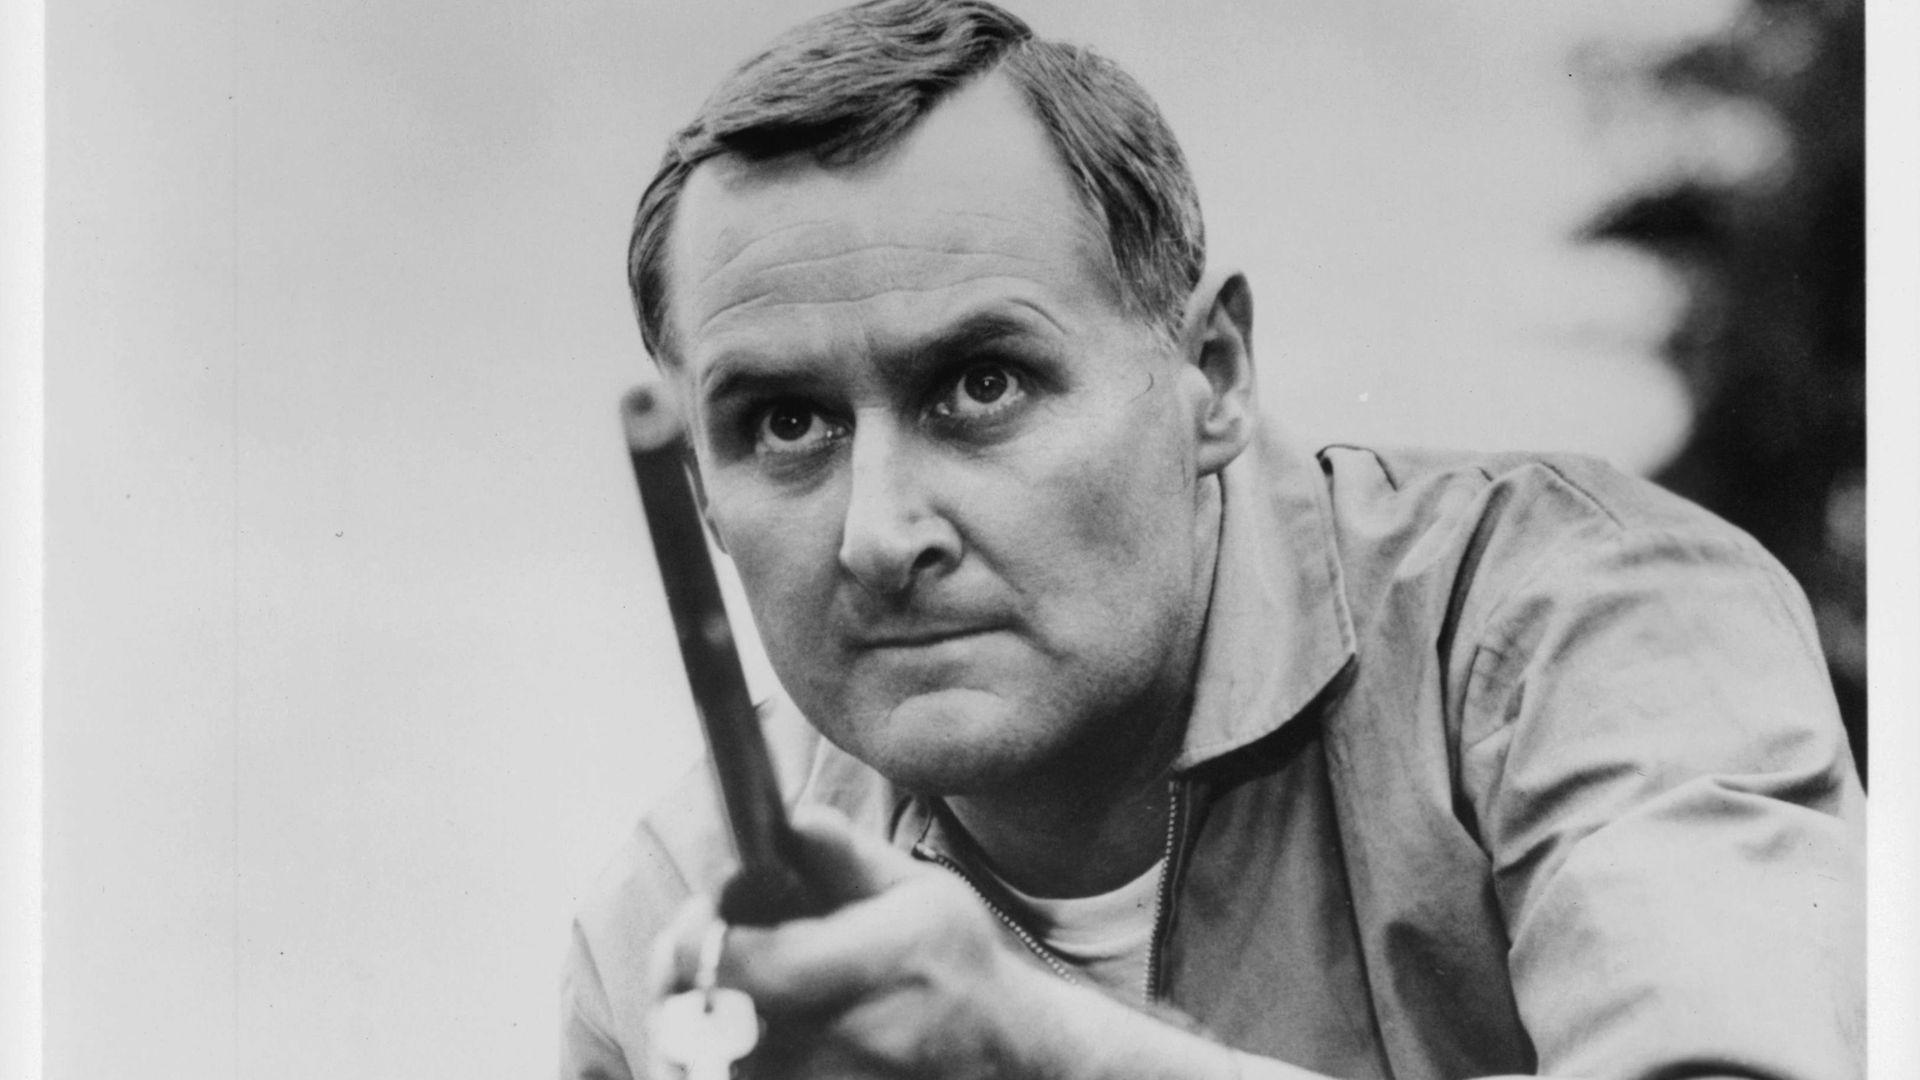 Peter Vaughan aiming gun in a scene from the 1965 film Fanatic, released in the US as Die! Die! My Darling! - Credit: Getty Images